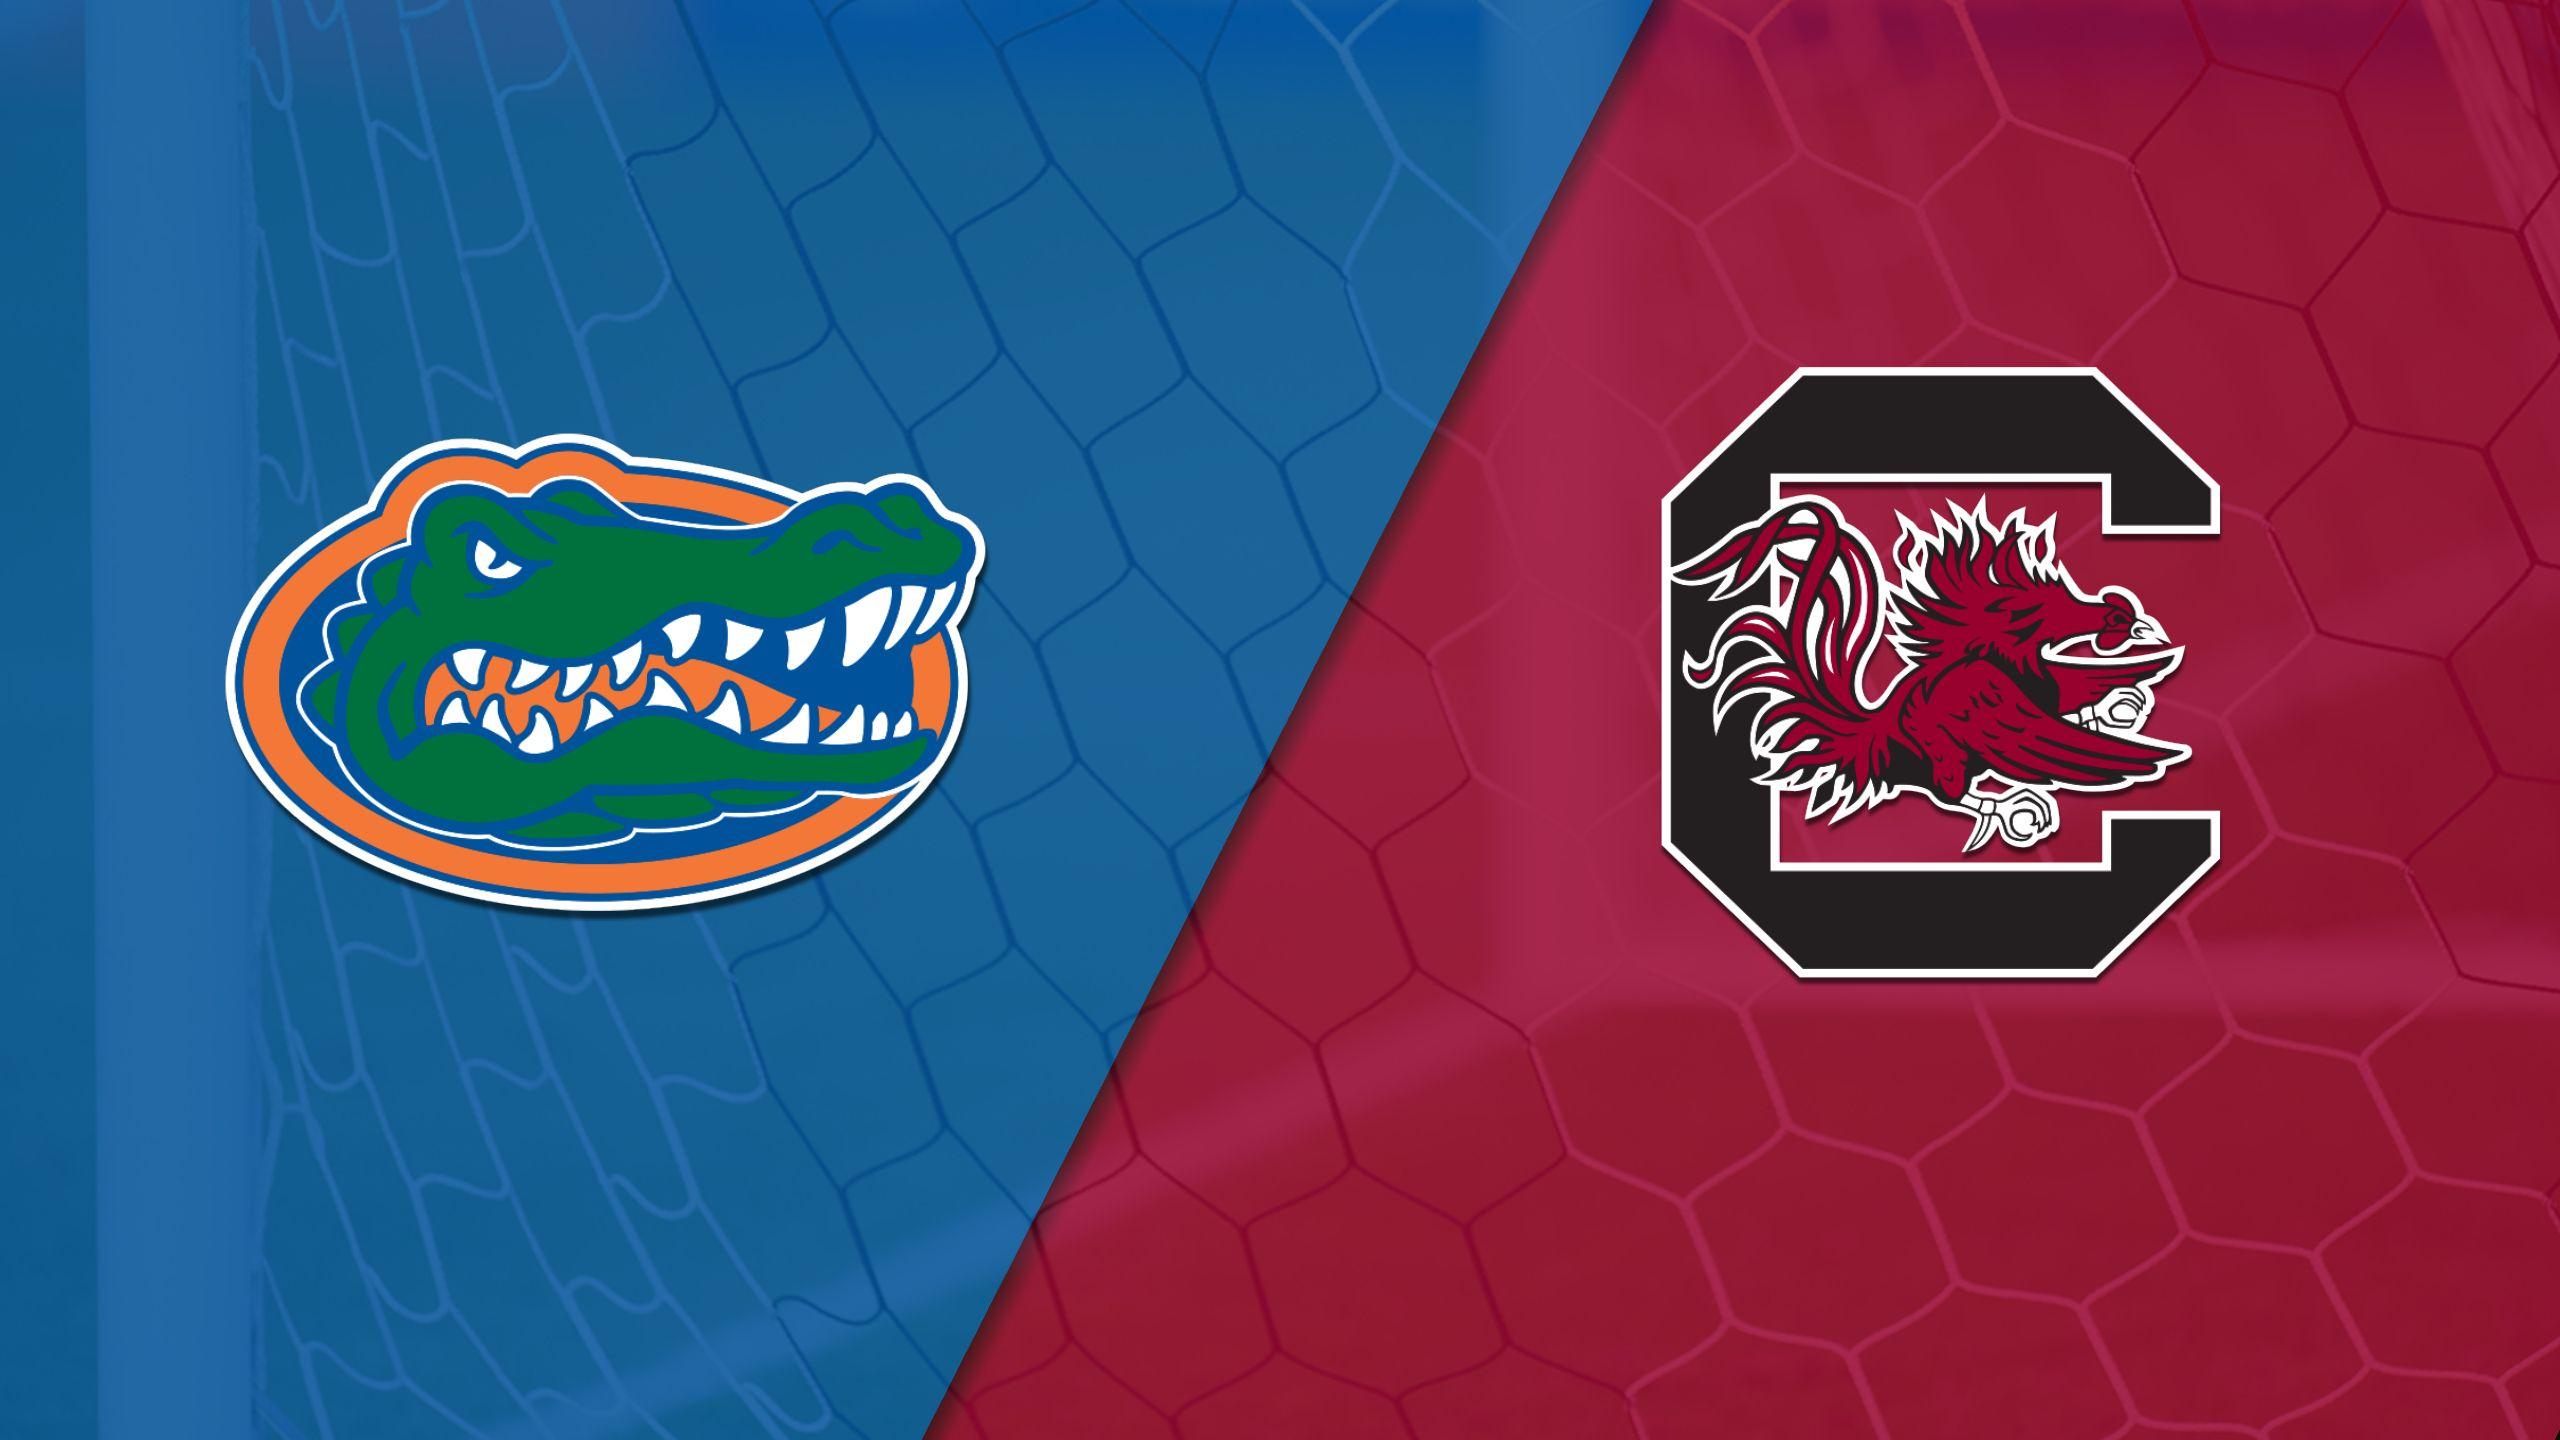 #3 Florida vs. #1 South Carolina (Quarterfinals) (NCAA Division I Women's Soccer Championship)